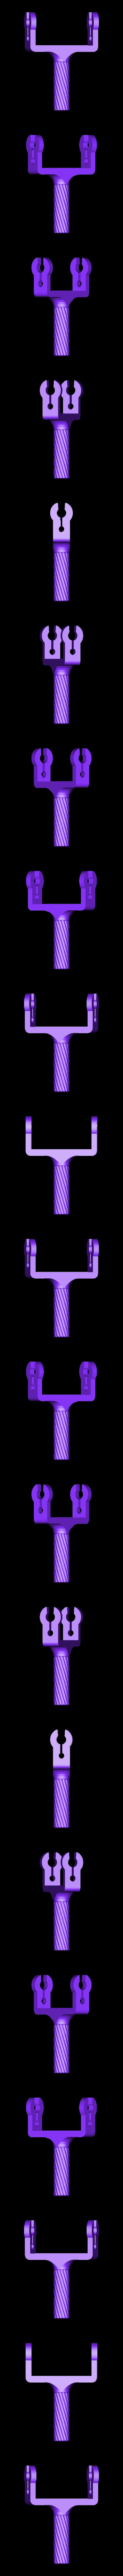 raczka.stl Download free STL file Massage tool (+v2) • 3D printing design, kpawel